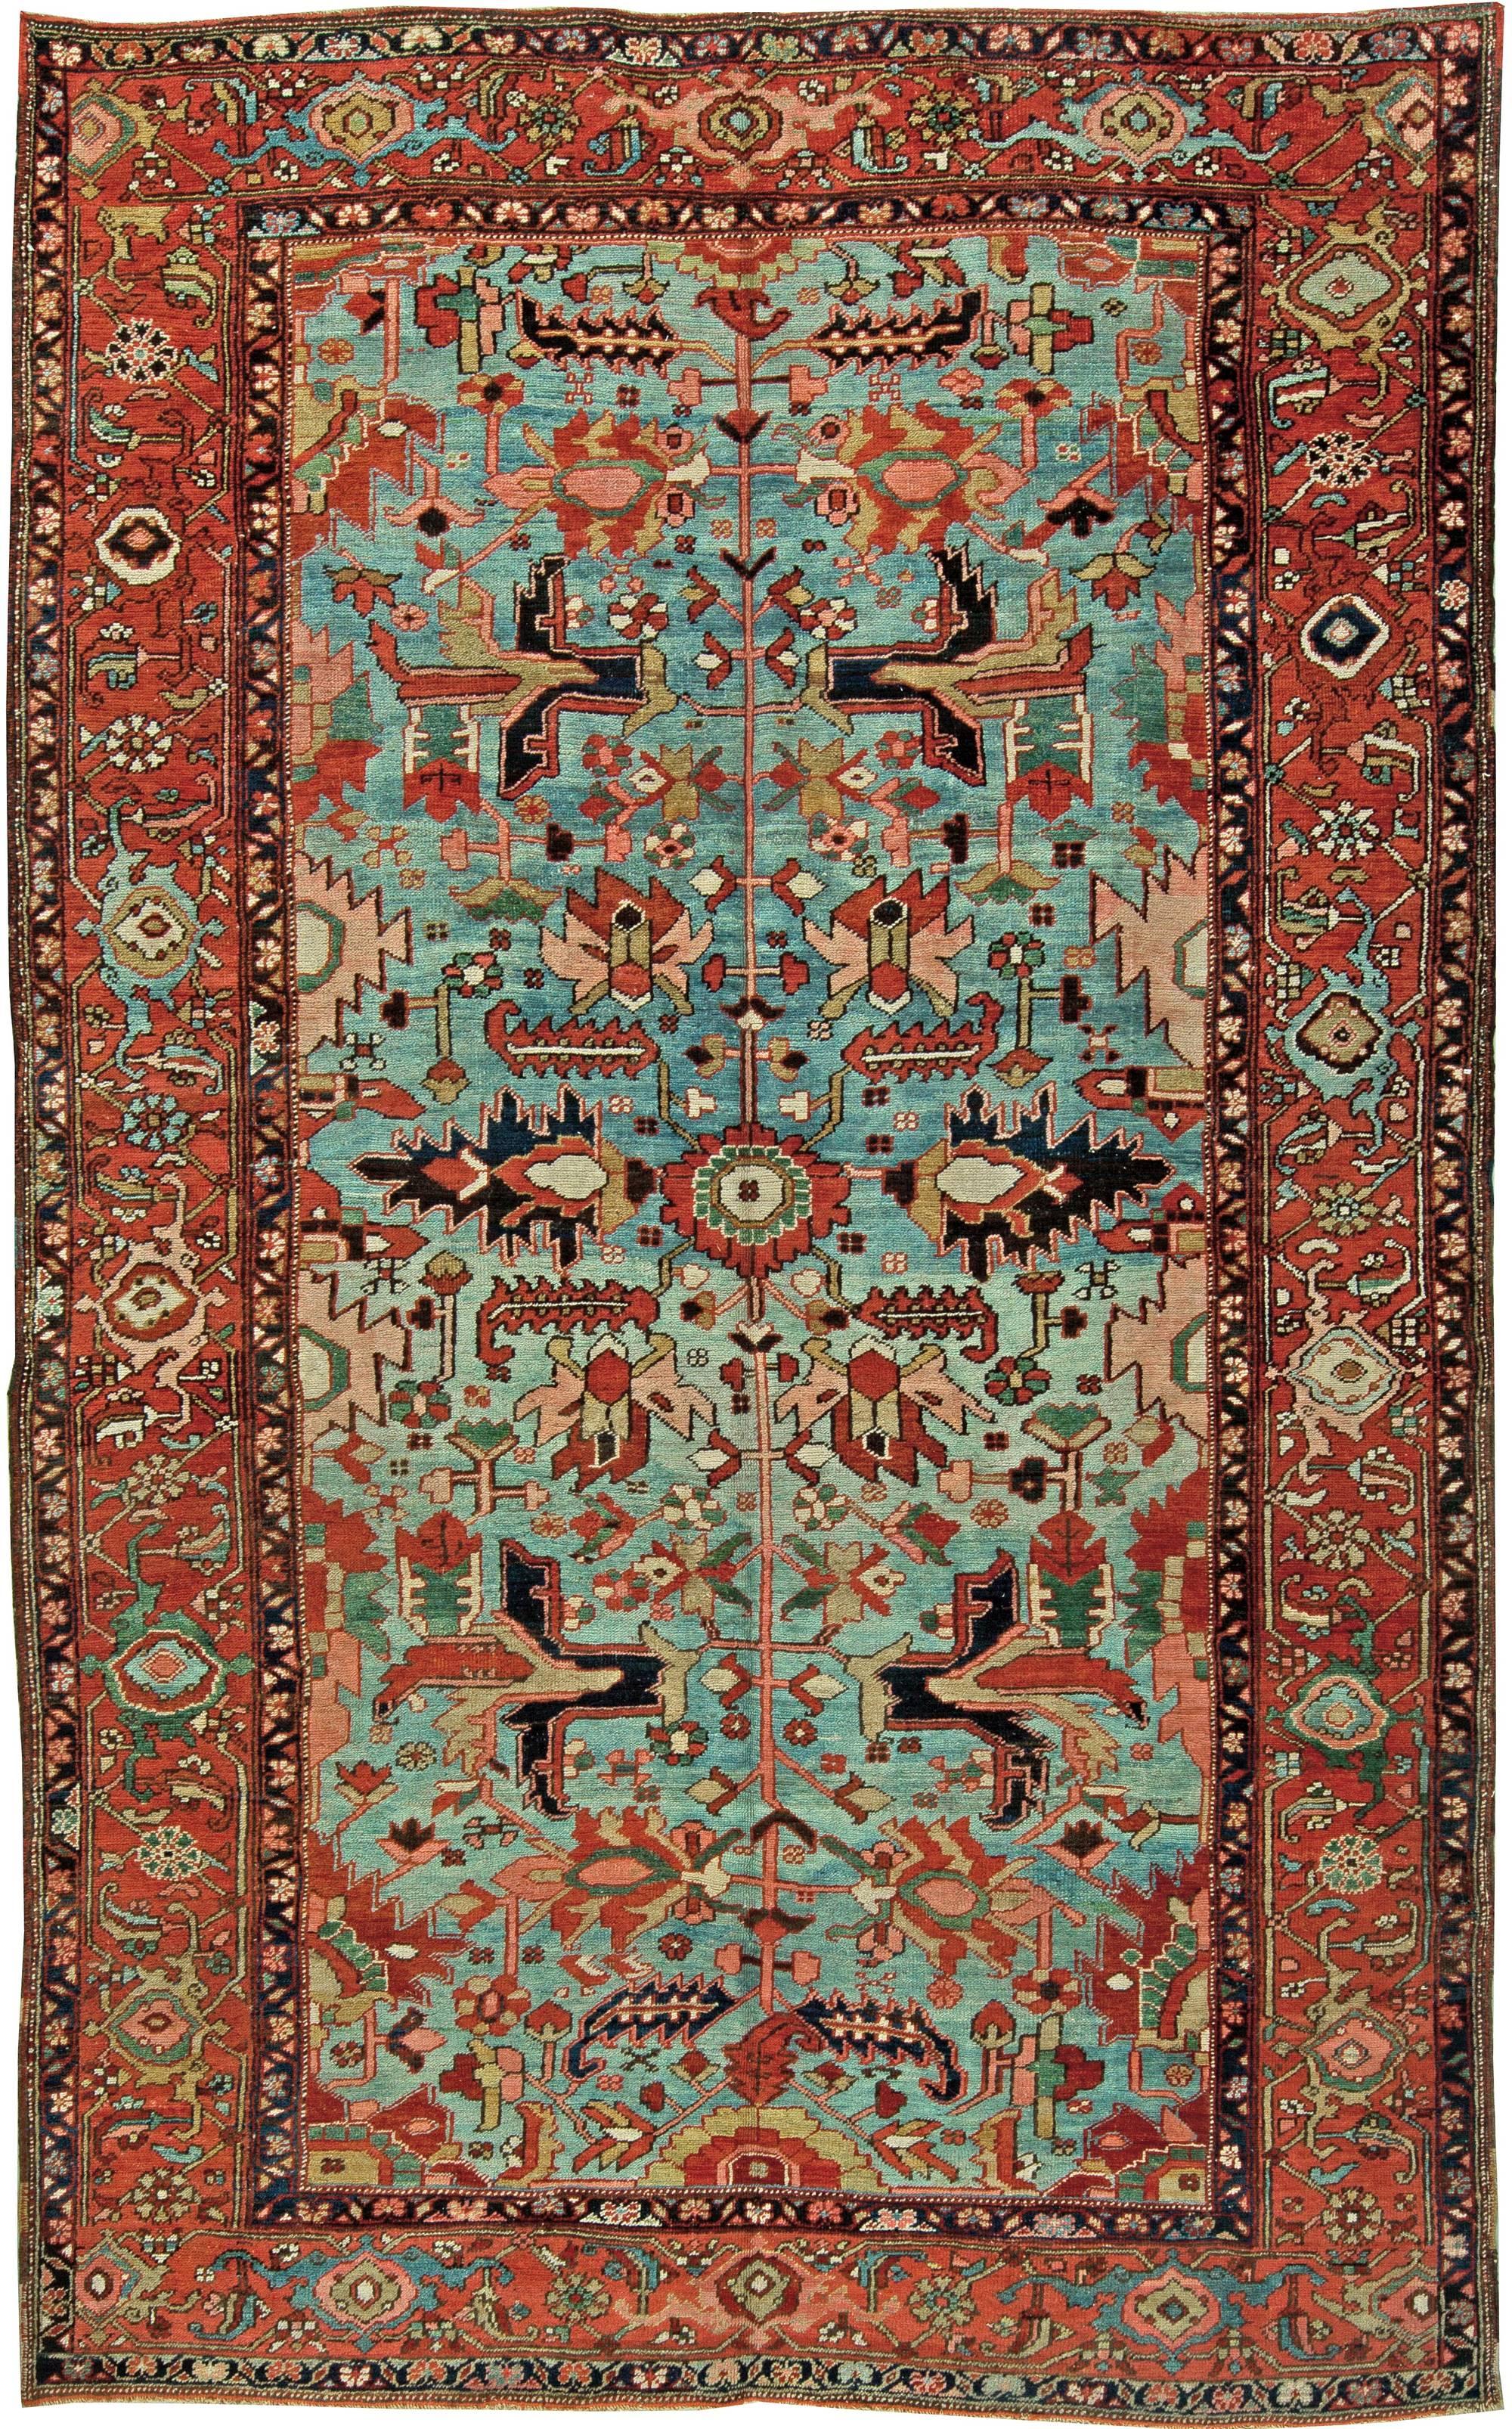 Heriz Rugs Serapi Antique Persian Bakshaish Carpets